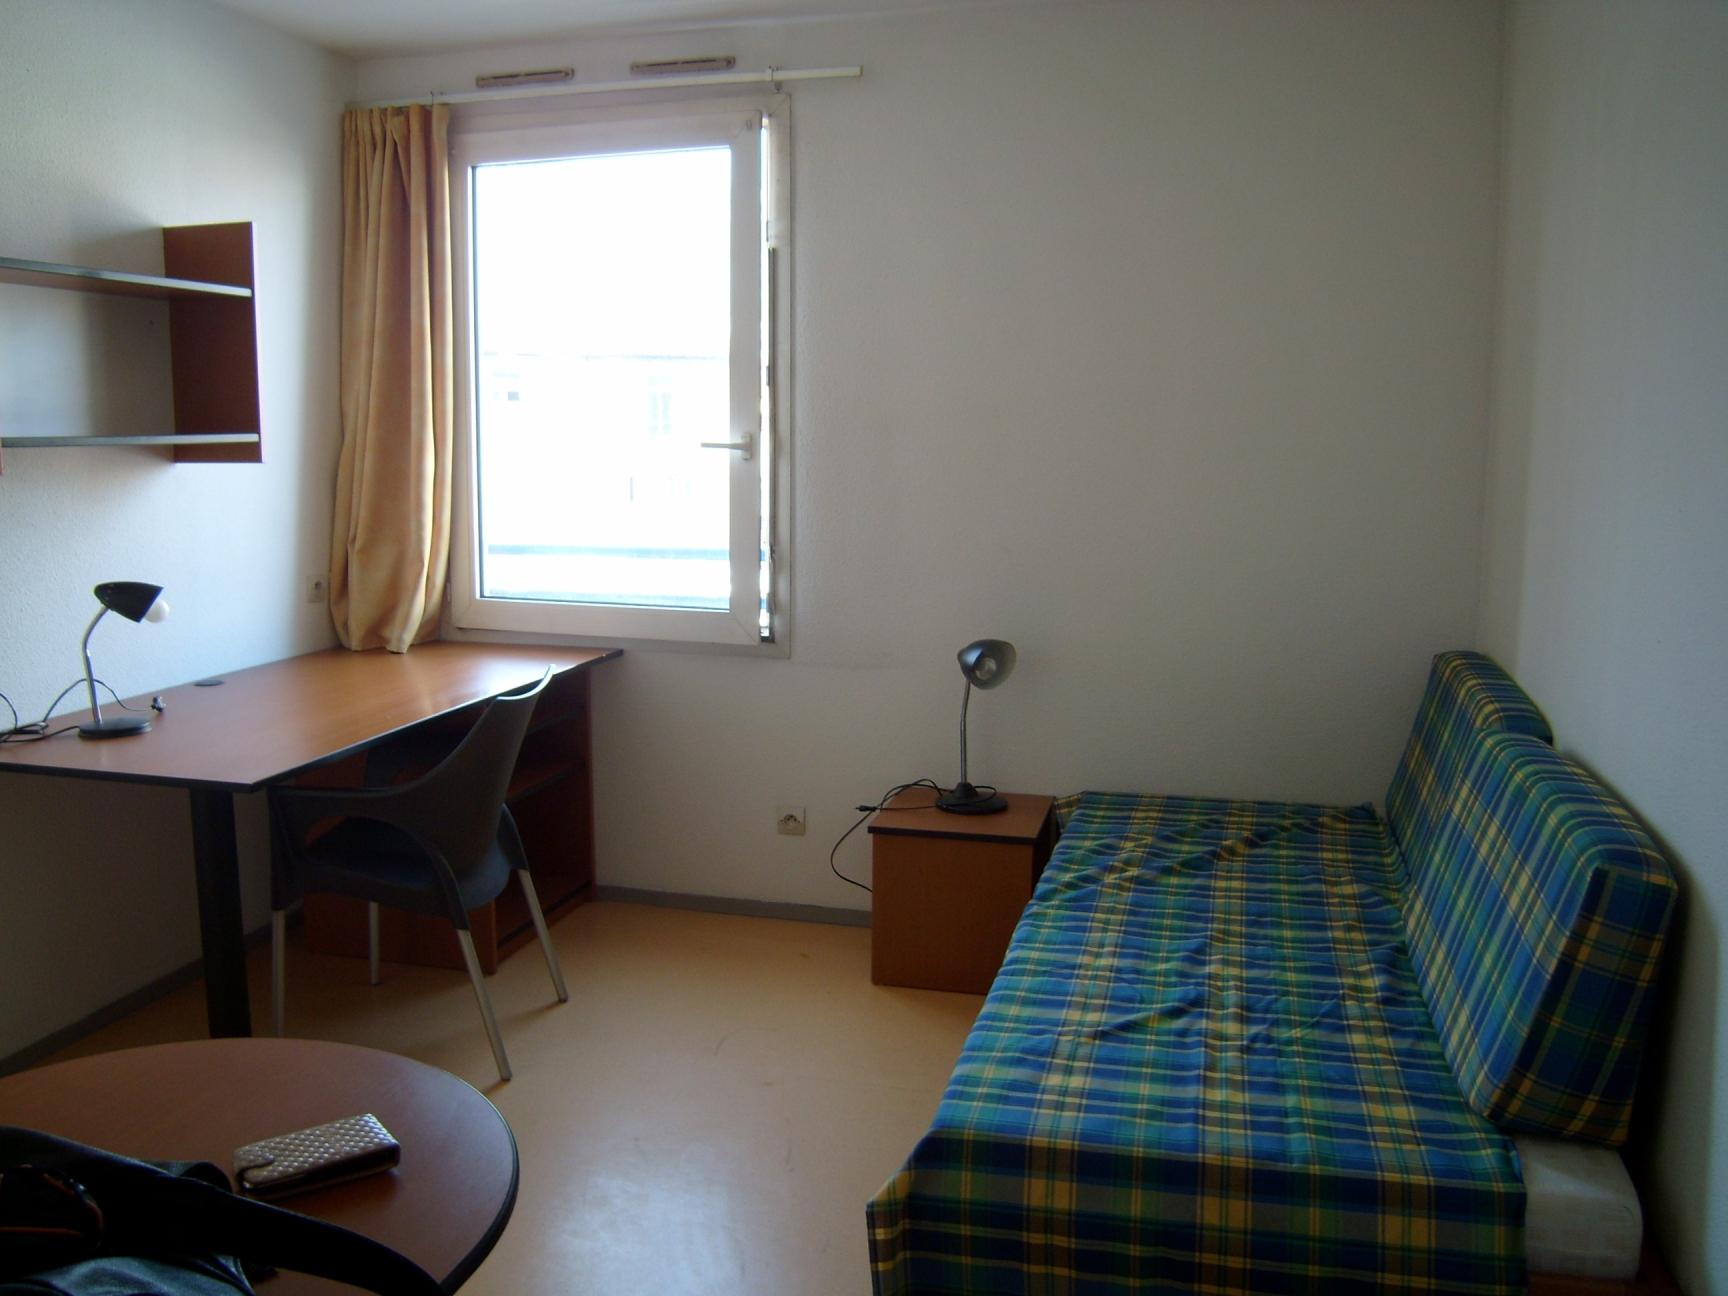 Location appartement villeurbanne agence immobili re - Appartement meuble villeurbanne ...